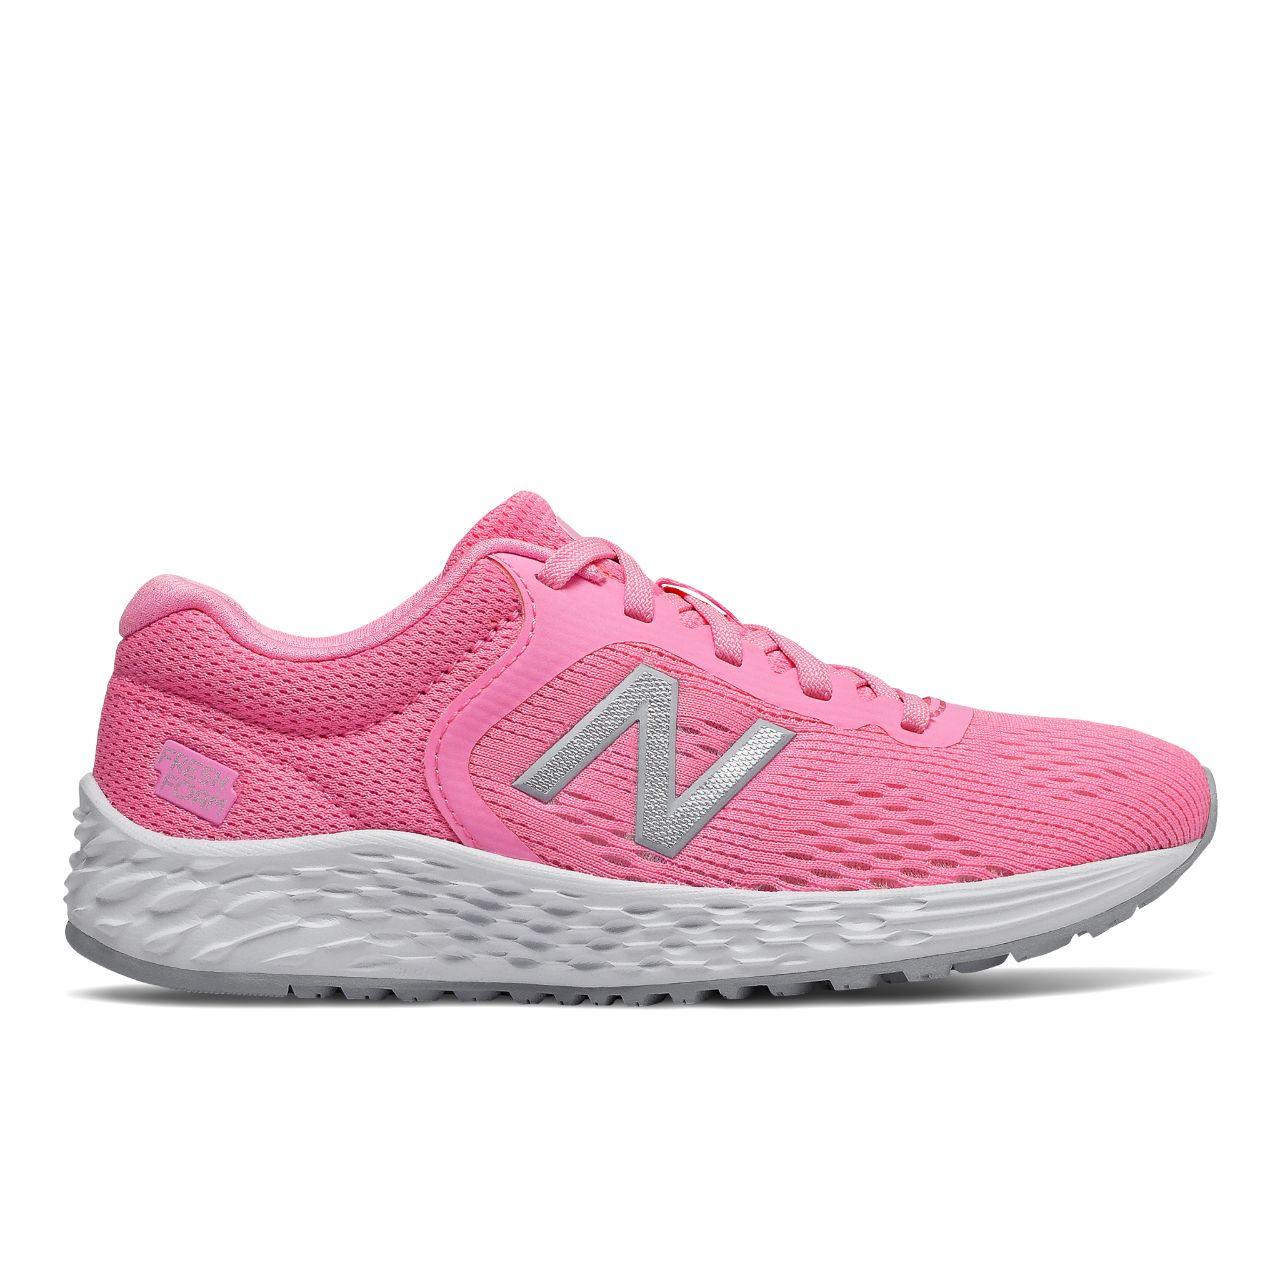 New Balance Kids Arishi Girls in Pink